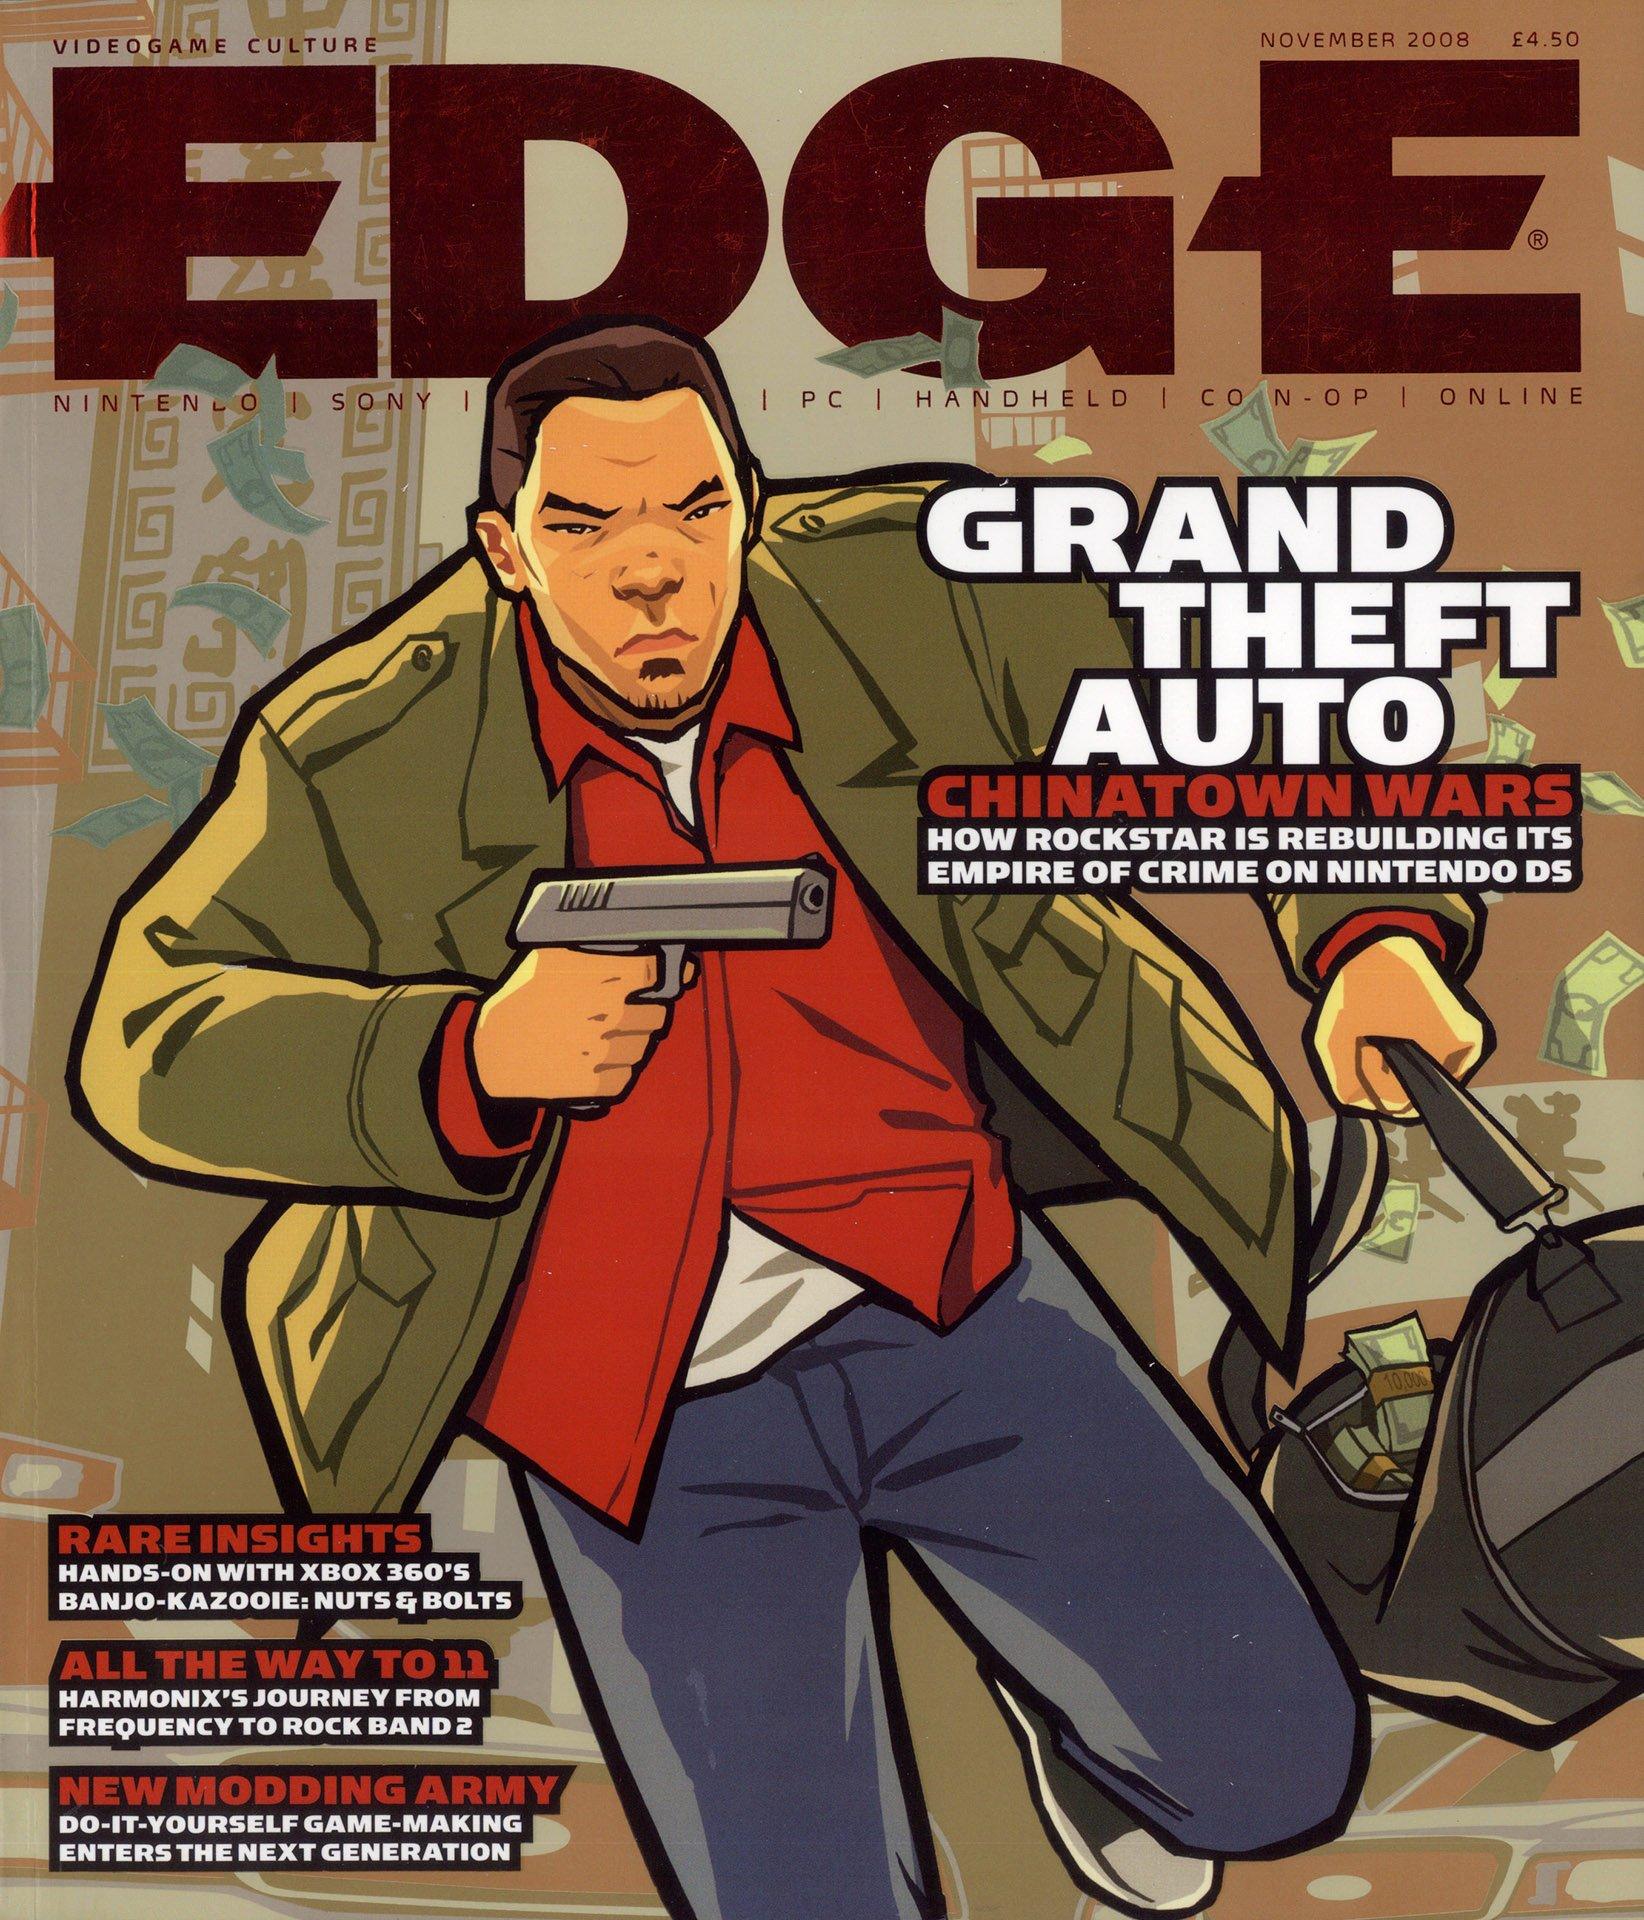 Edge 194 (November 2008)